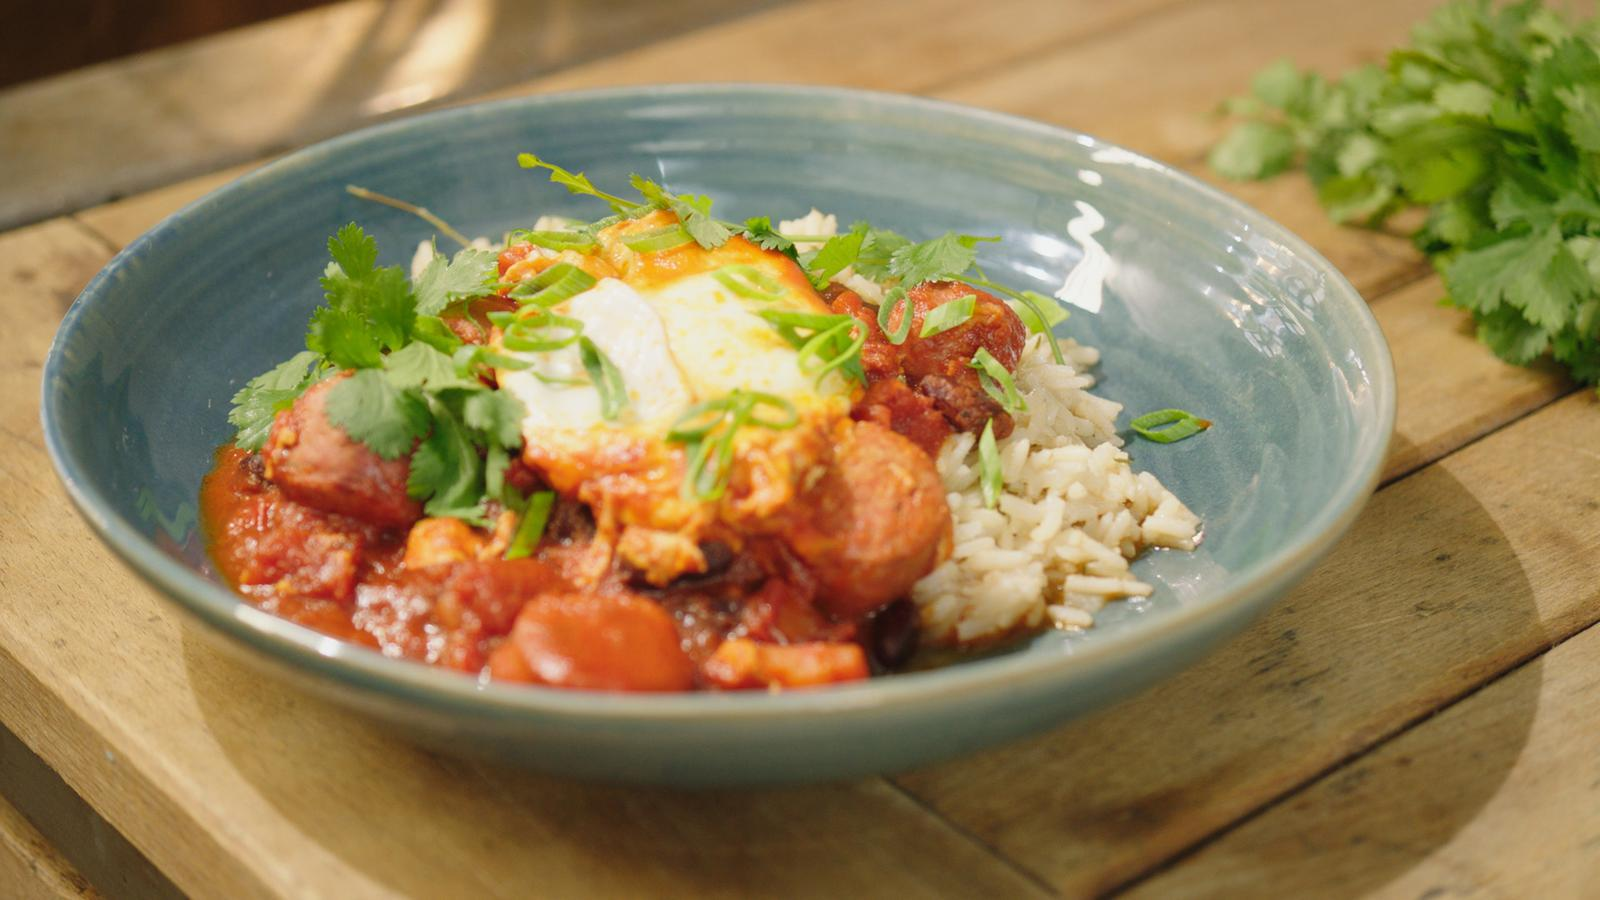 Chili con carne met chorizo en gepocheerde eieren